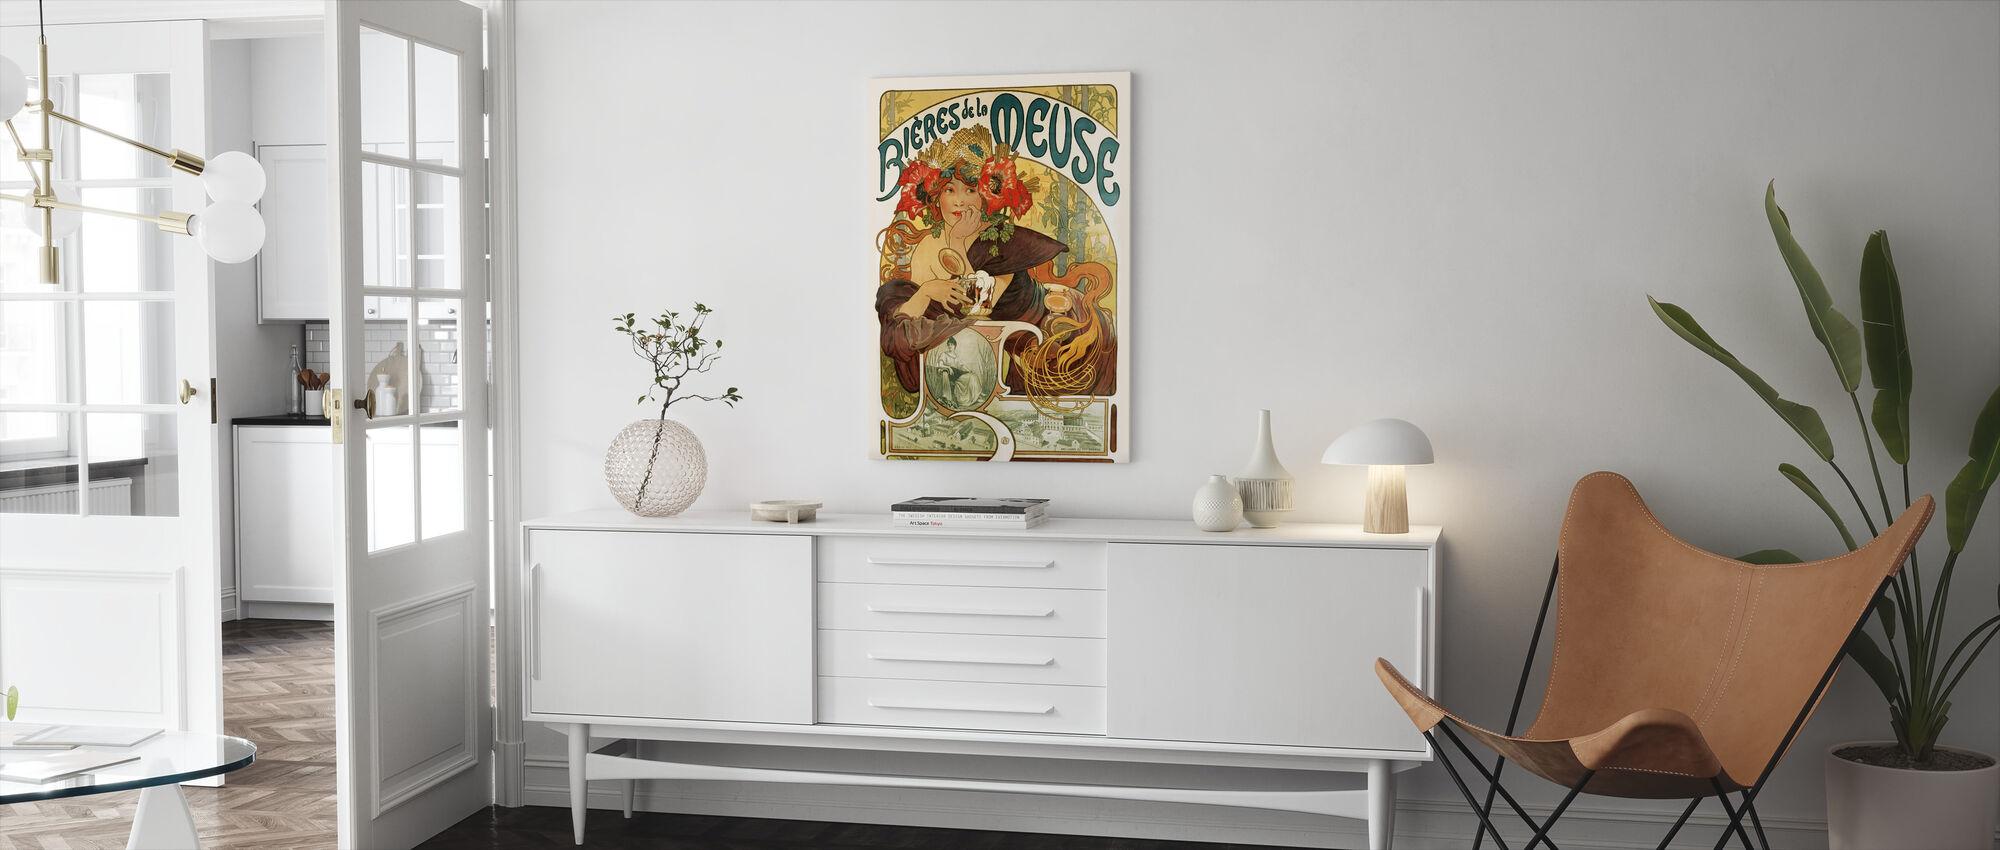 Alphonse Mucha - Bieres de La Meuse - Canvas print - Living Room